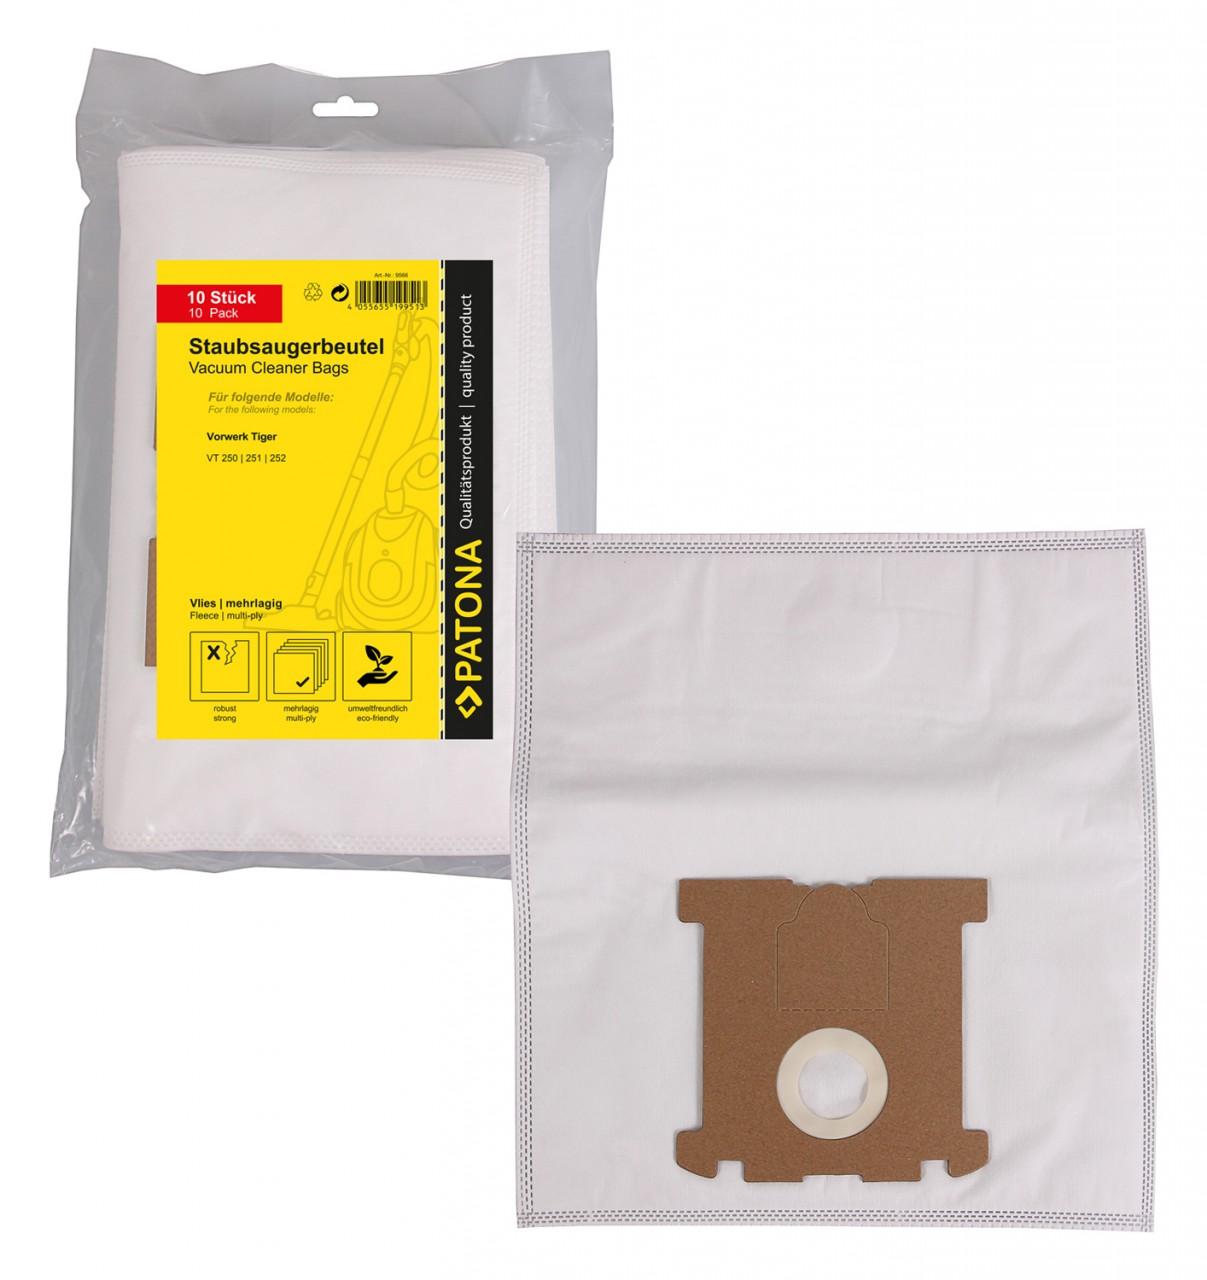 PATONA 10 STOFZUIGER bag multi layer fleece f. Vorwerk Tiger